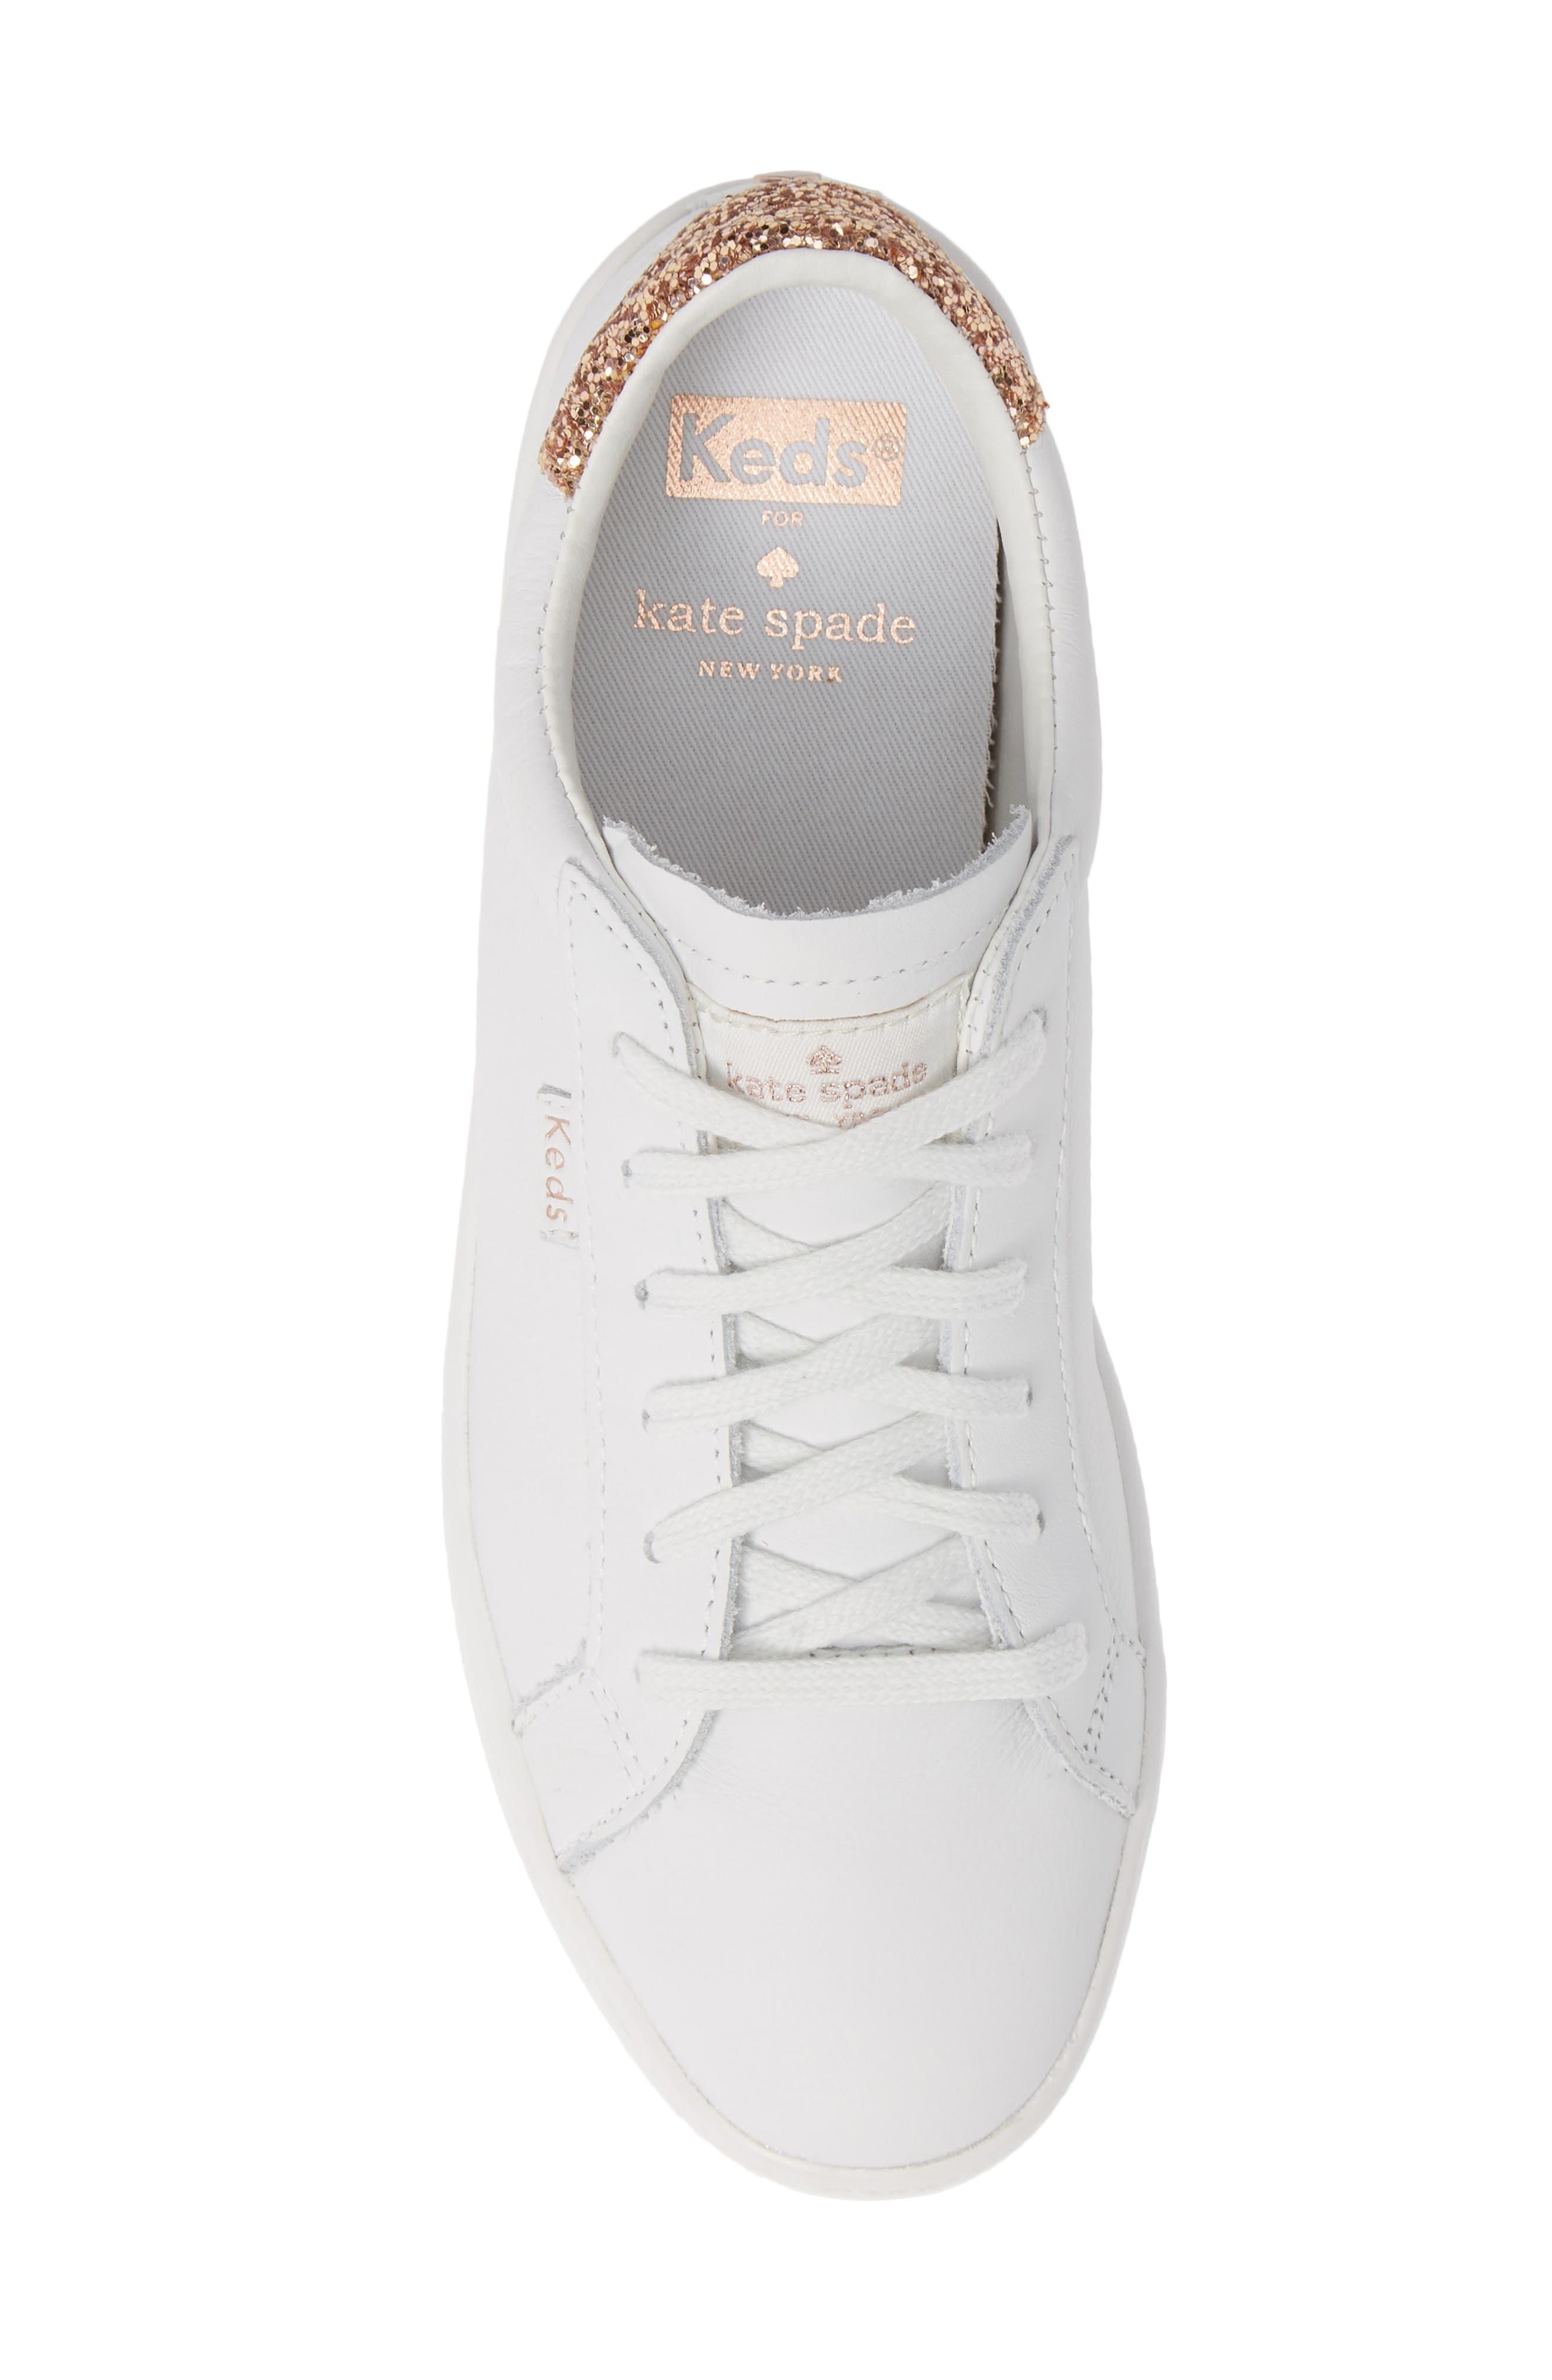 KEDS<SUP>®</SUP> FOR KATE SPADE NEW YORK, ace glitter sneaker, Alternate thumbnail 5, color, 100